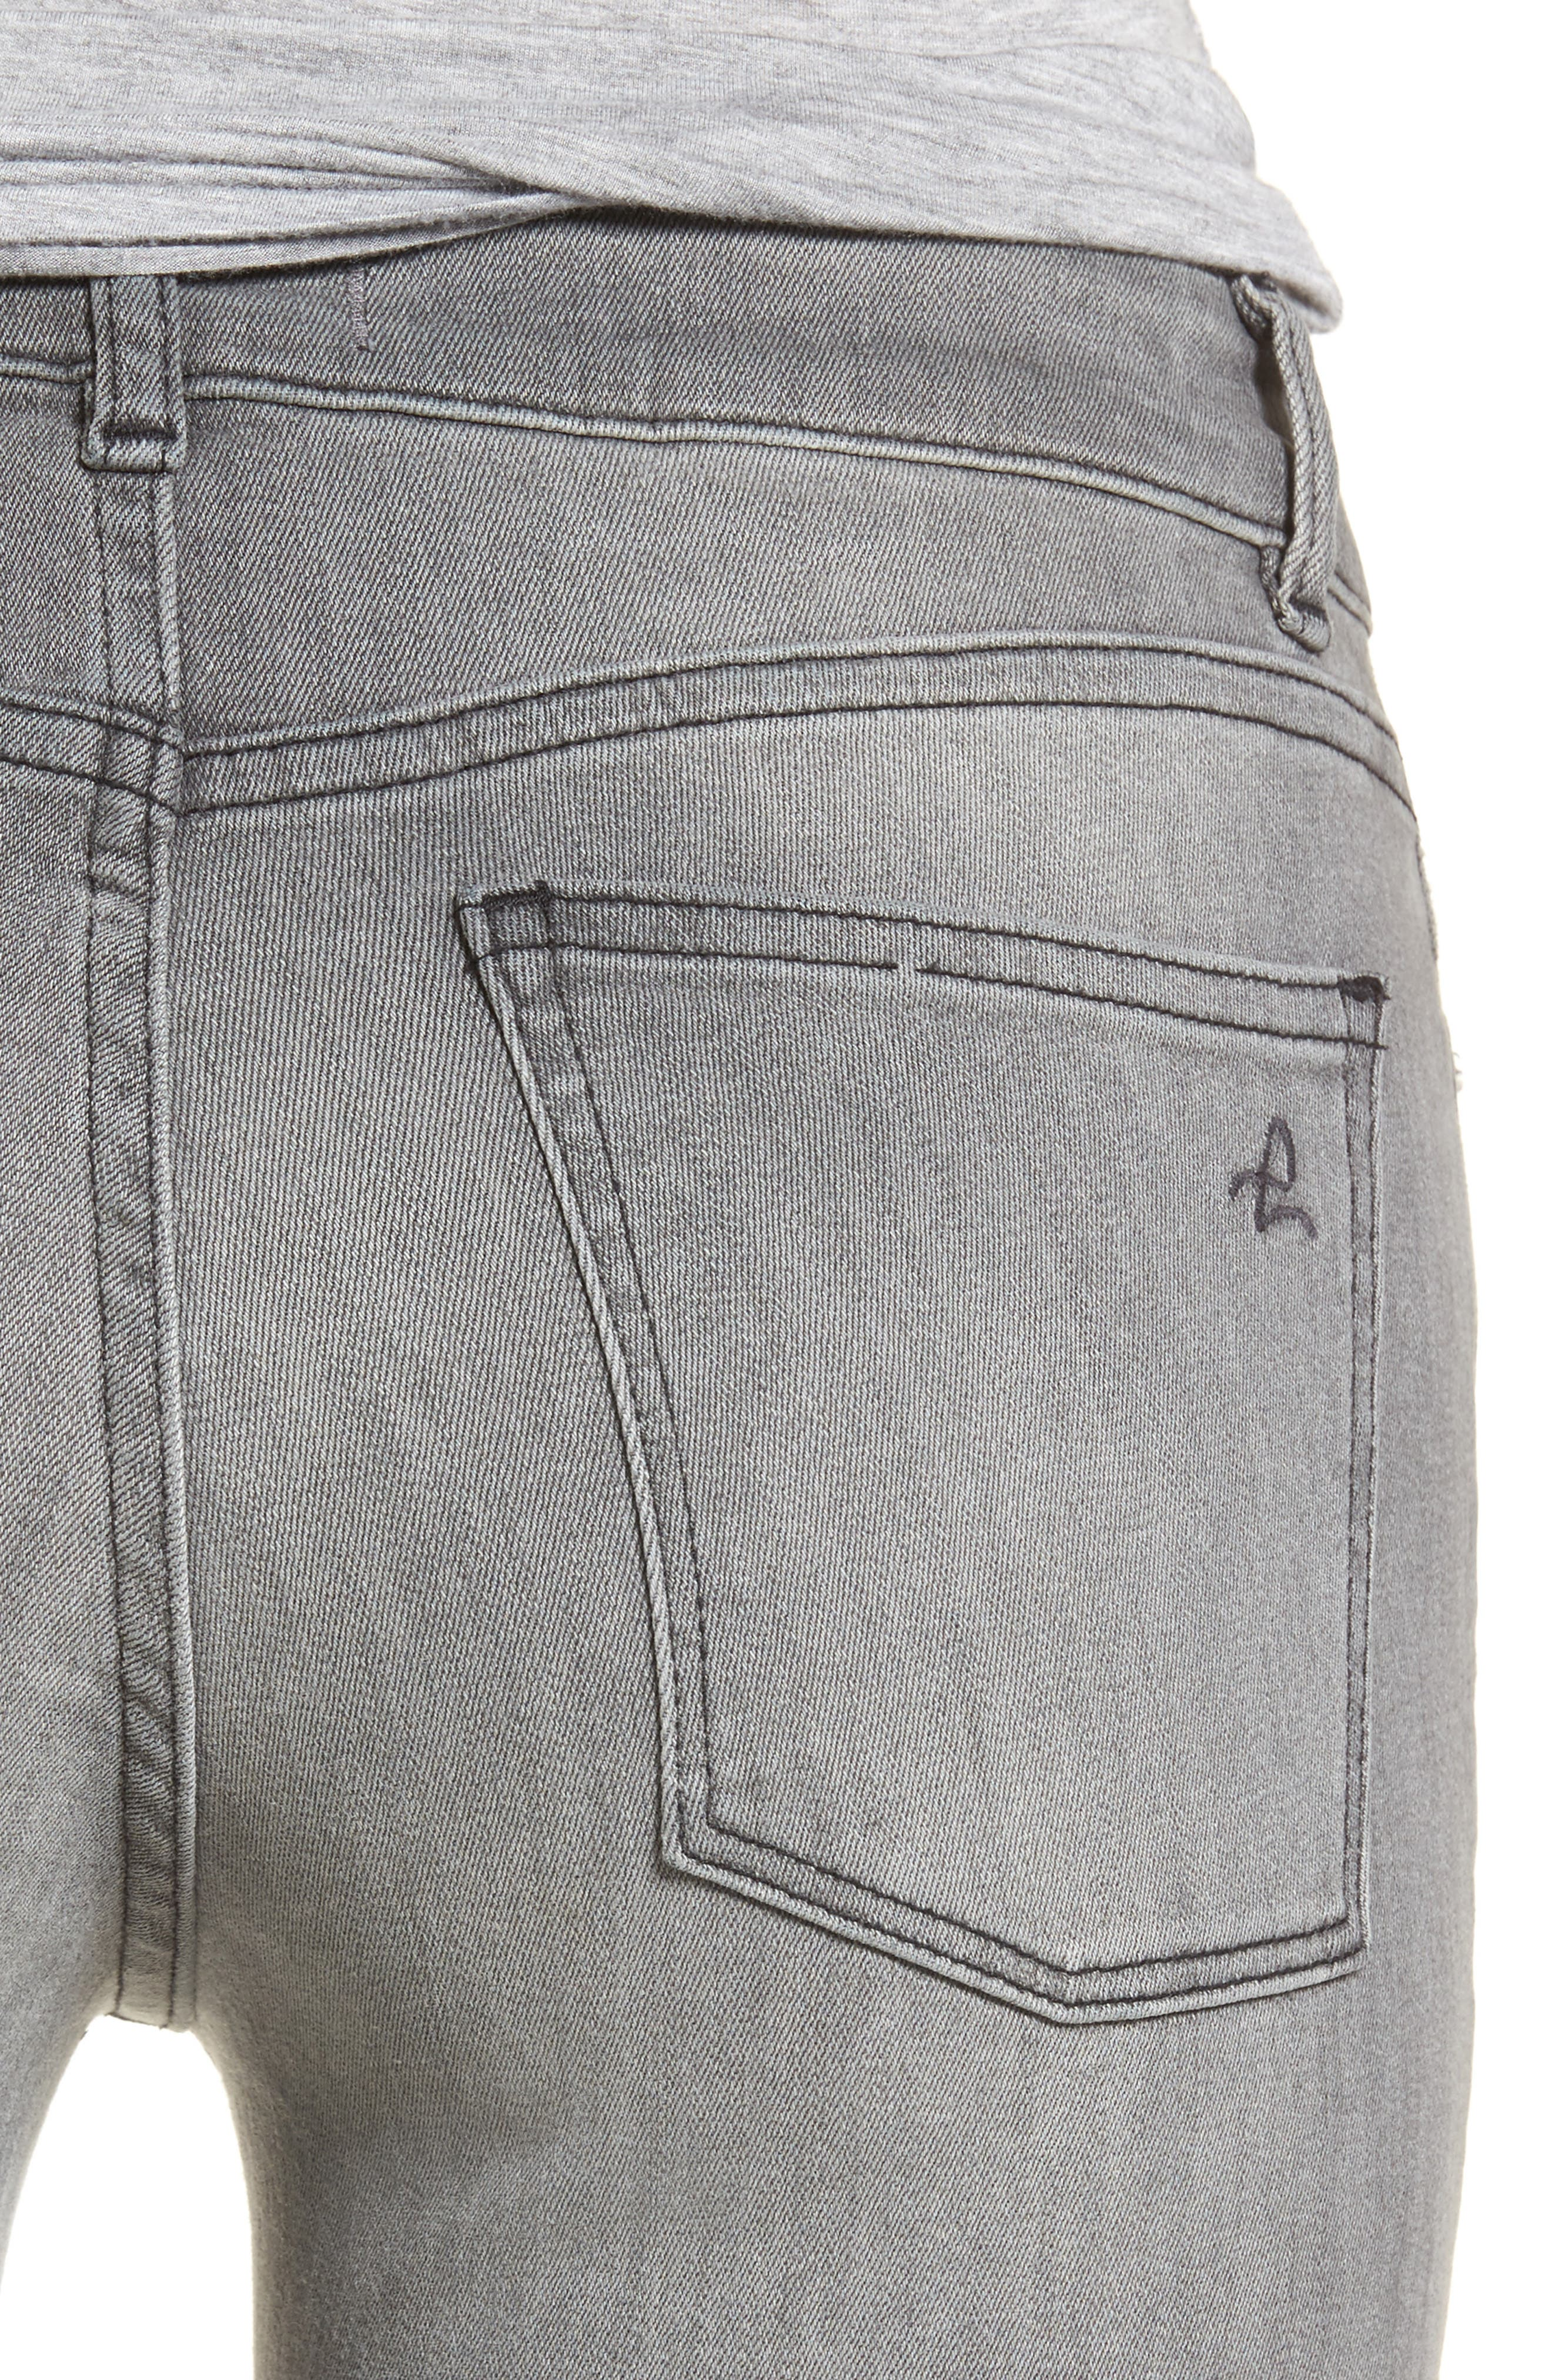 Emma Power Legging Jeans,                             Alternate thumbnail 4, color,                             Tarrant